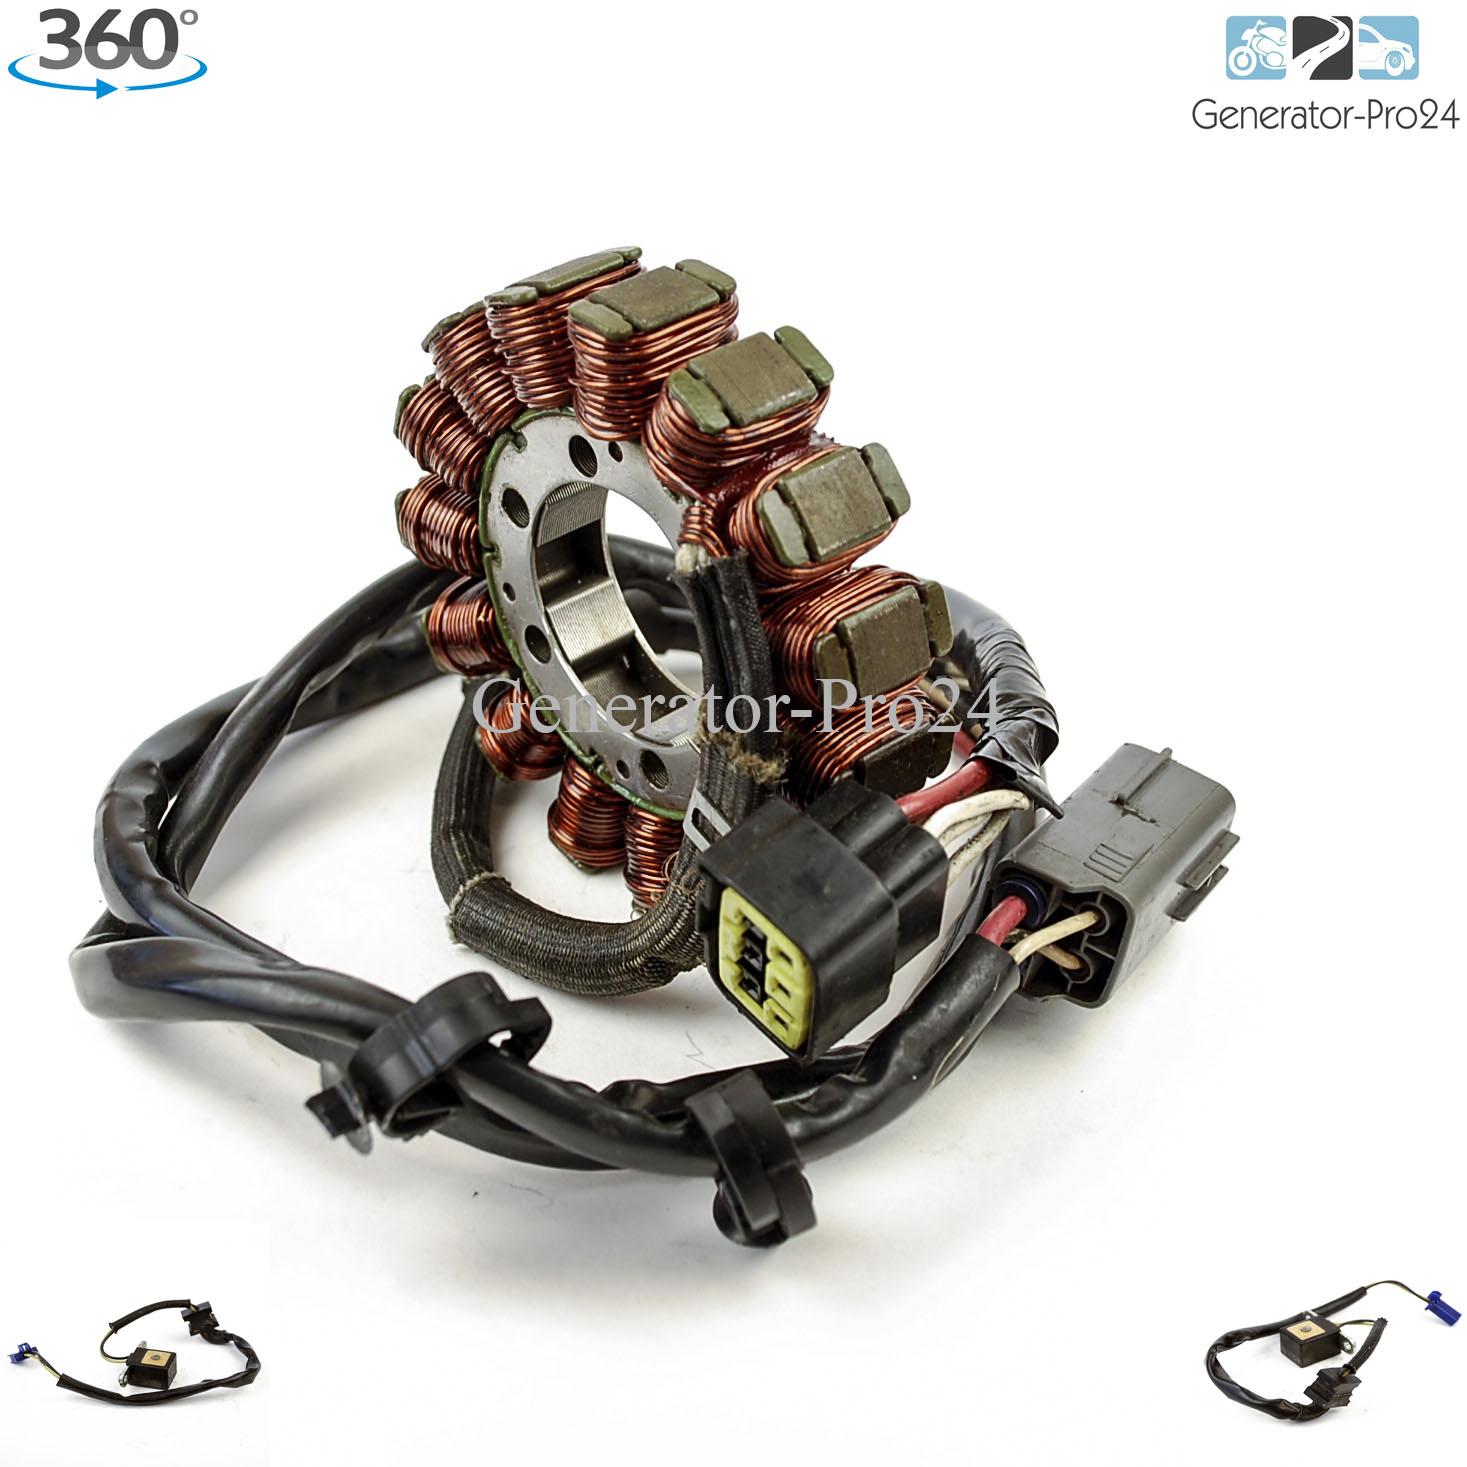 Kawasaki Stator Assembly Oem 21003 0053 Generator Pro24